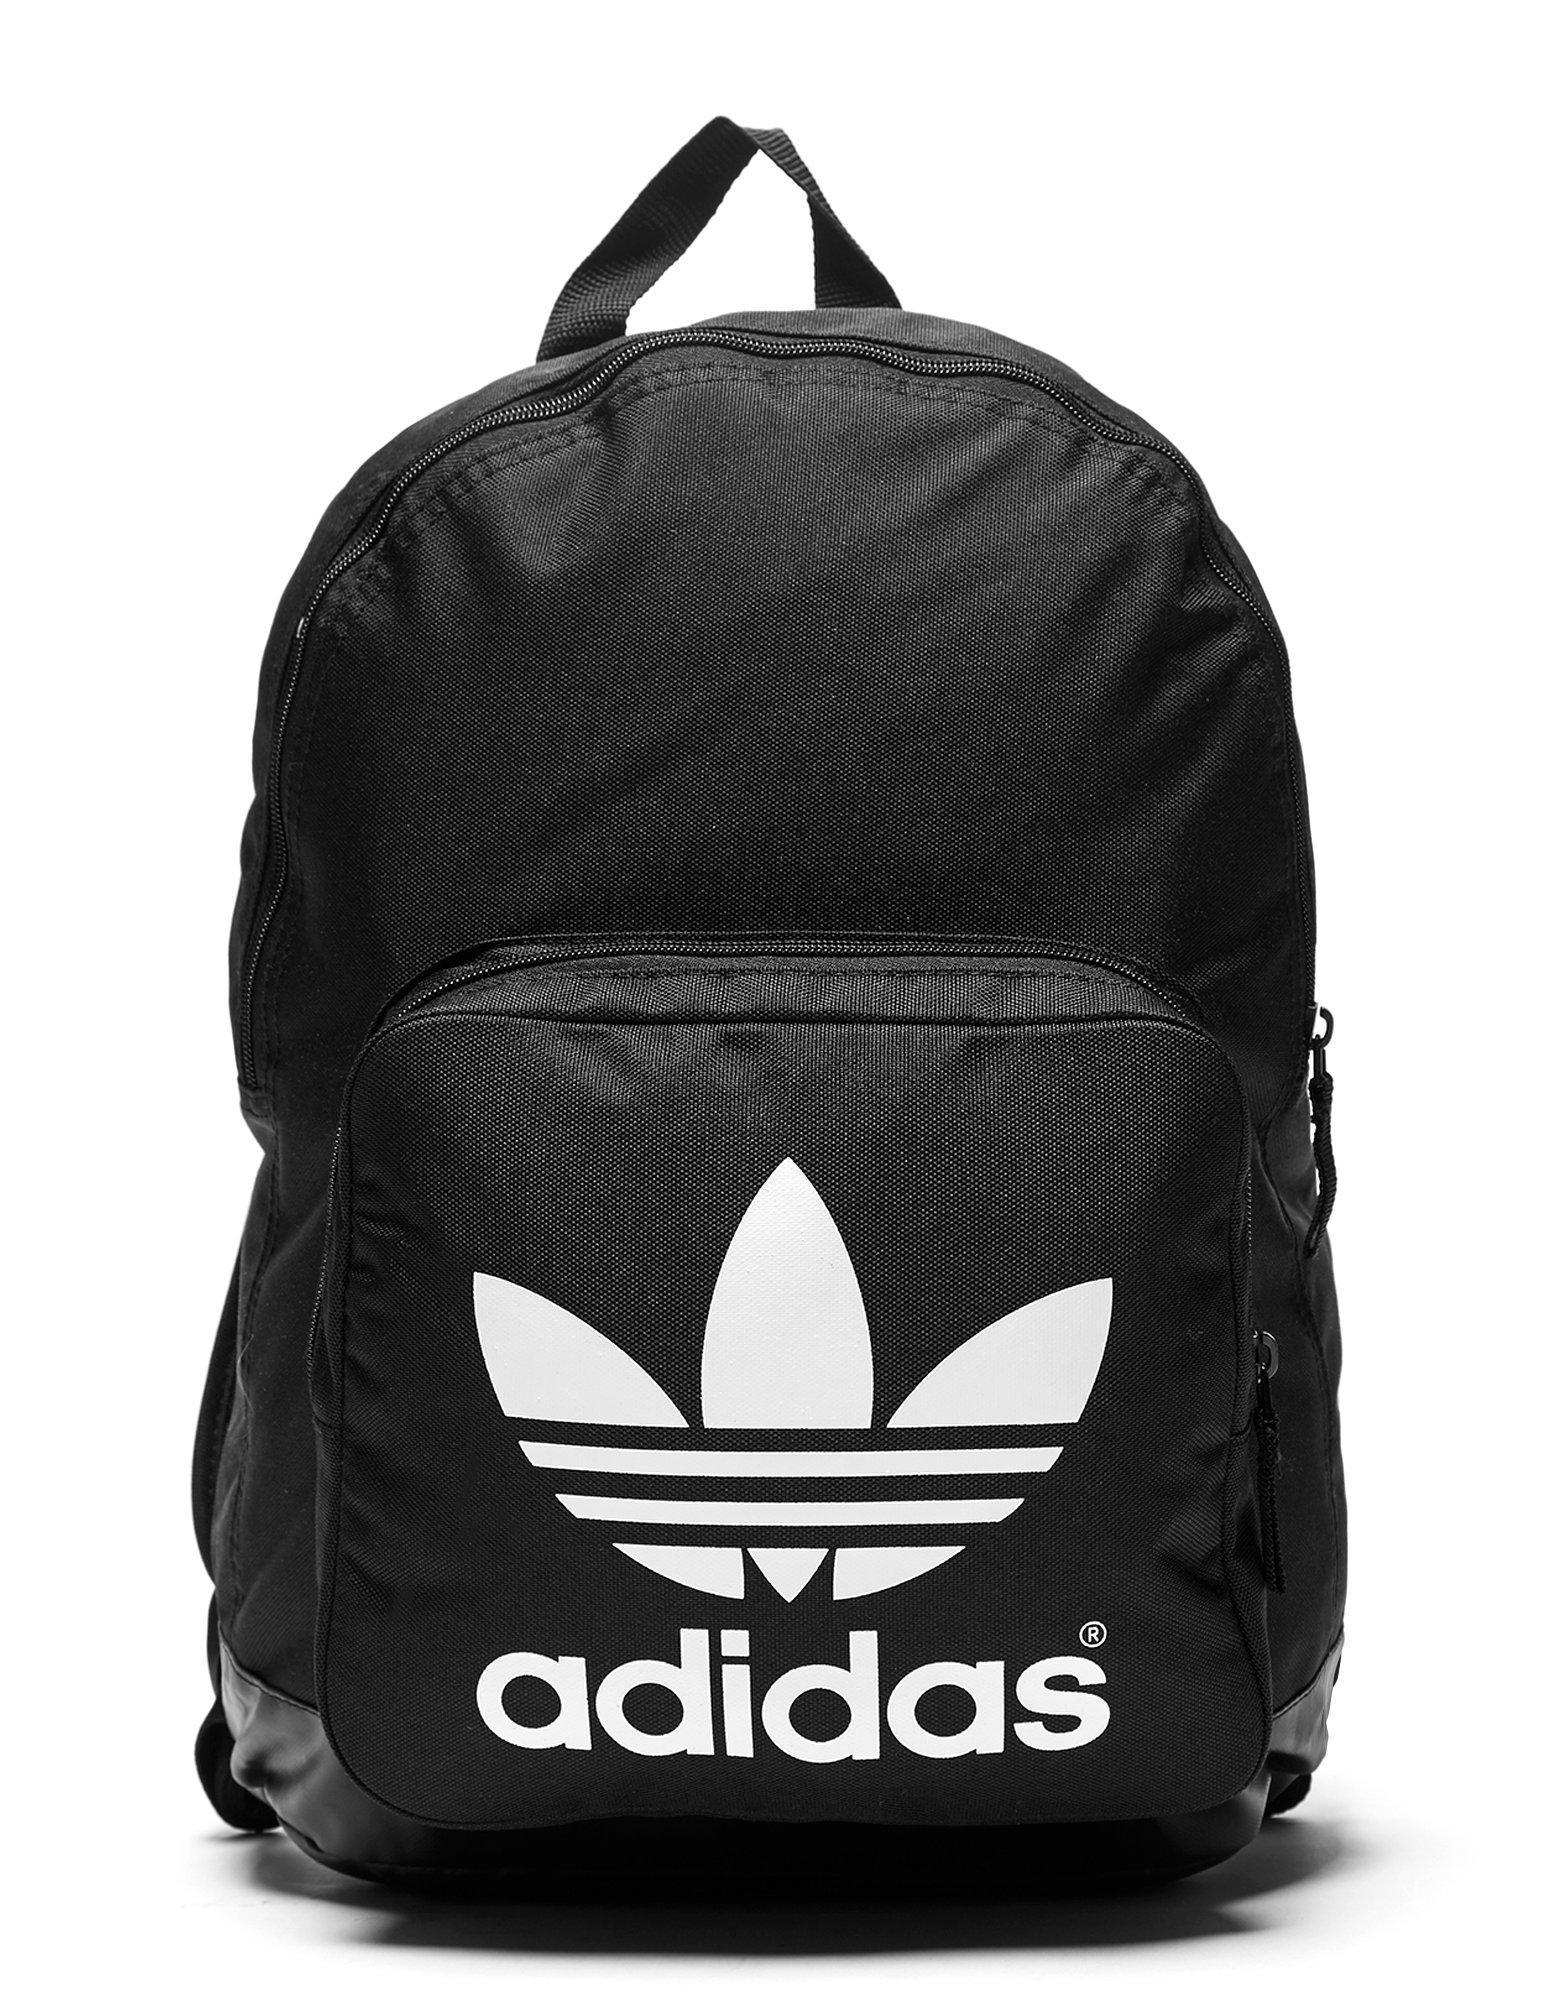 Lyst Adidas Originals Sport Backpack In Black For Men